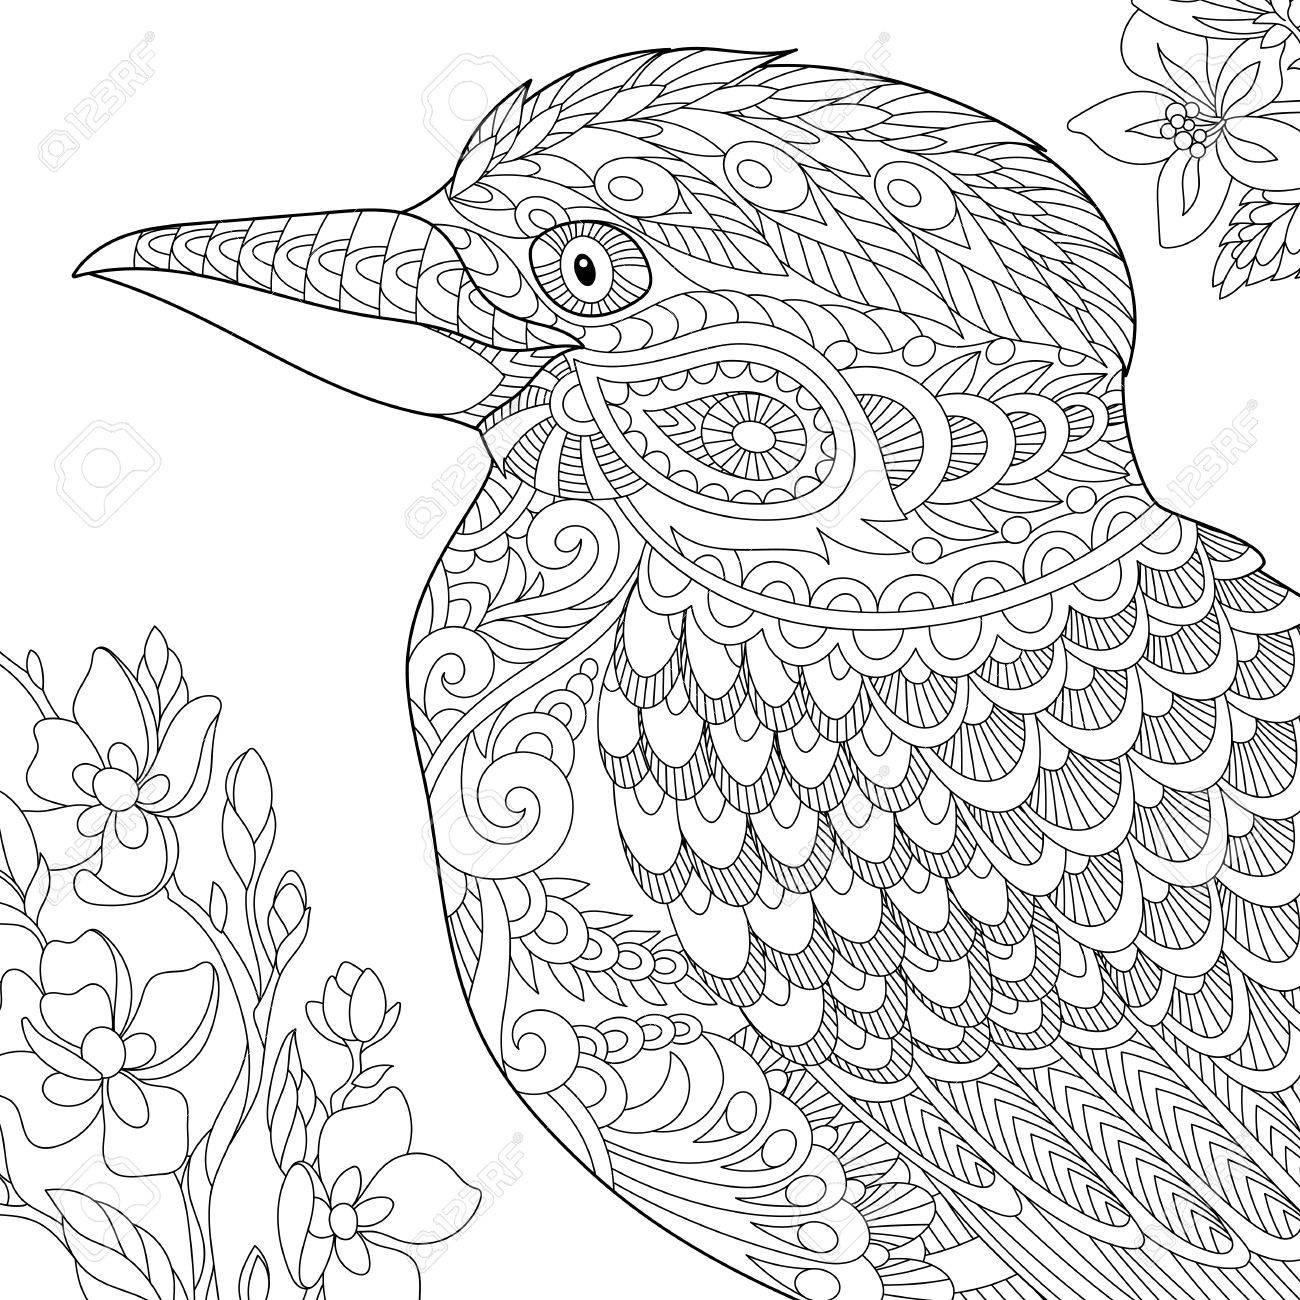 Lujoso Pájaro Carpintero Leonado Para Colorear Molde - Enmarcado ...